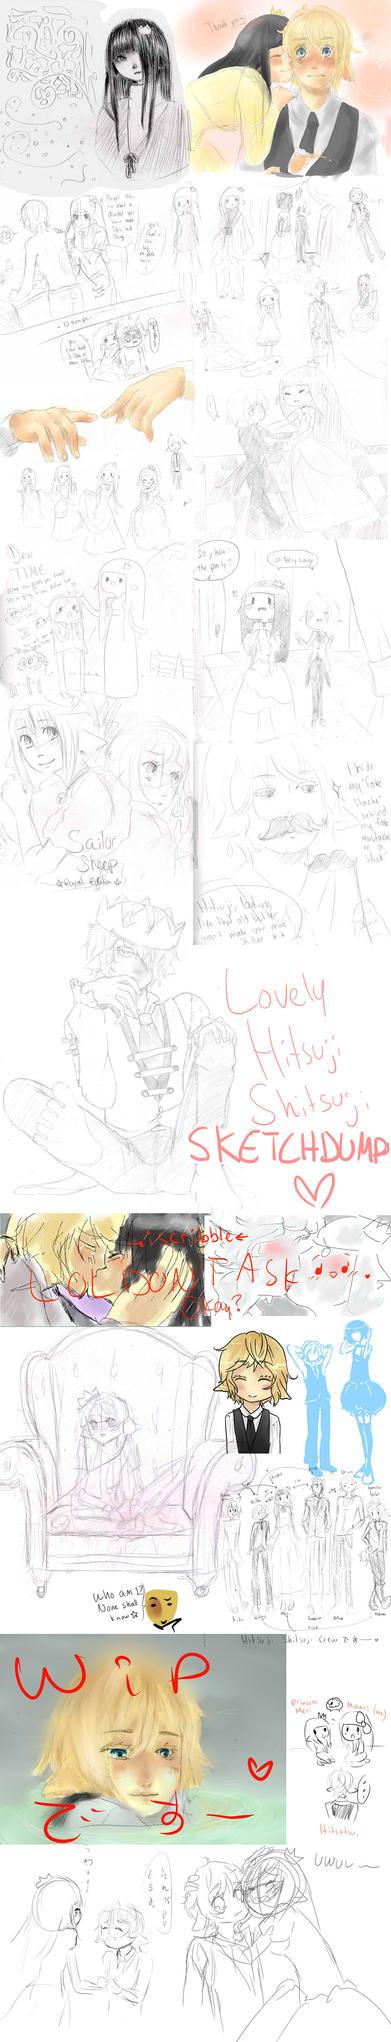 Hitsu Sketch Dump by Maari-Erein